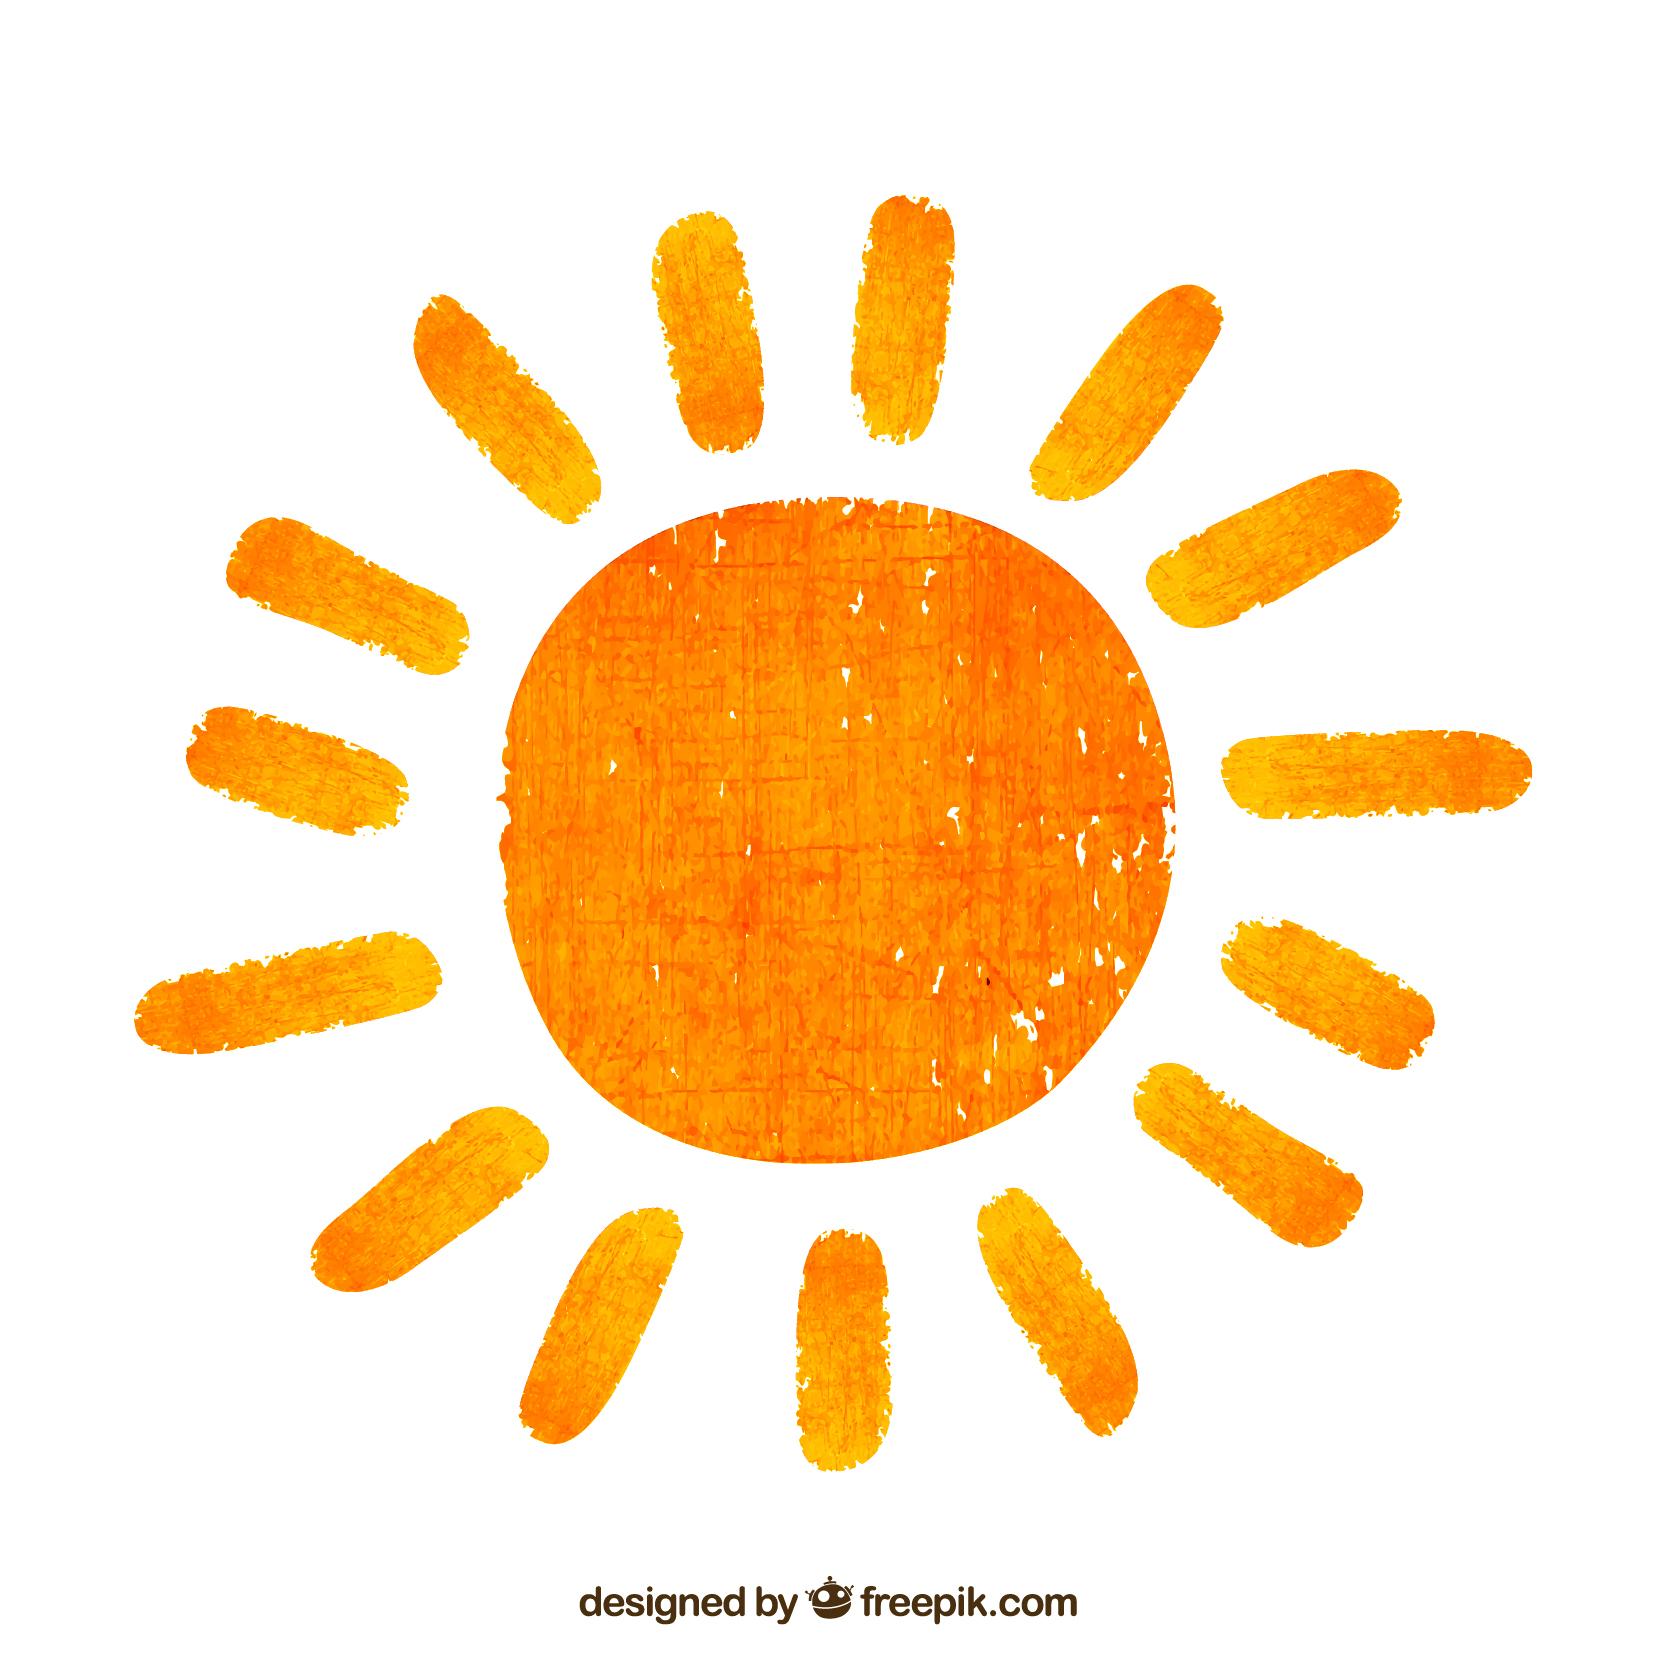 https://www.freepik.com/free-vector/hand-painted-sun_787087.htm